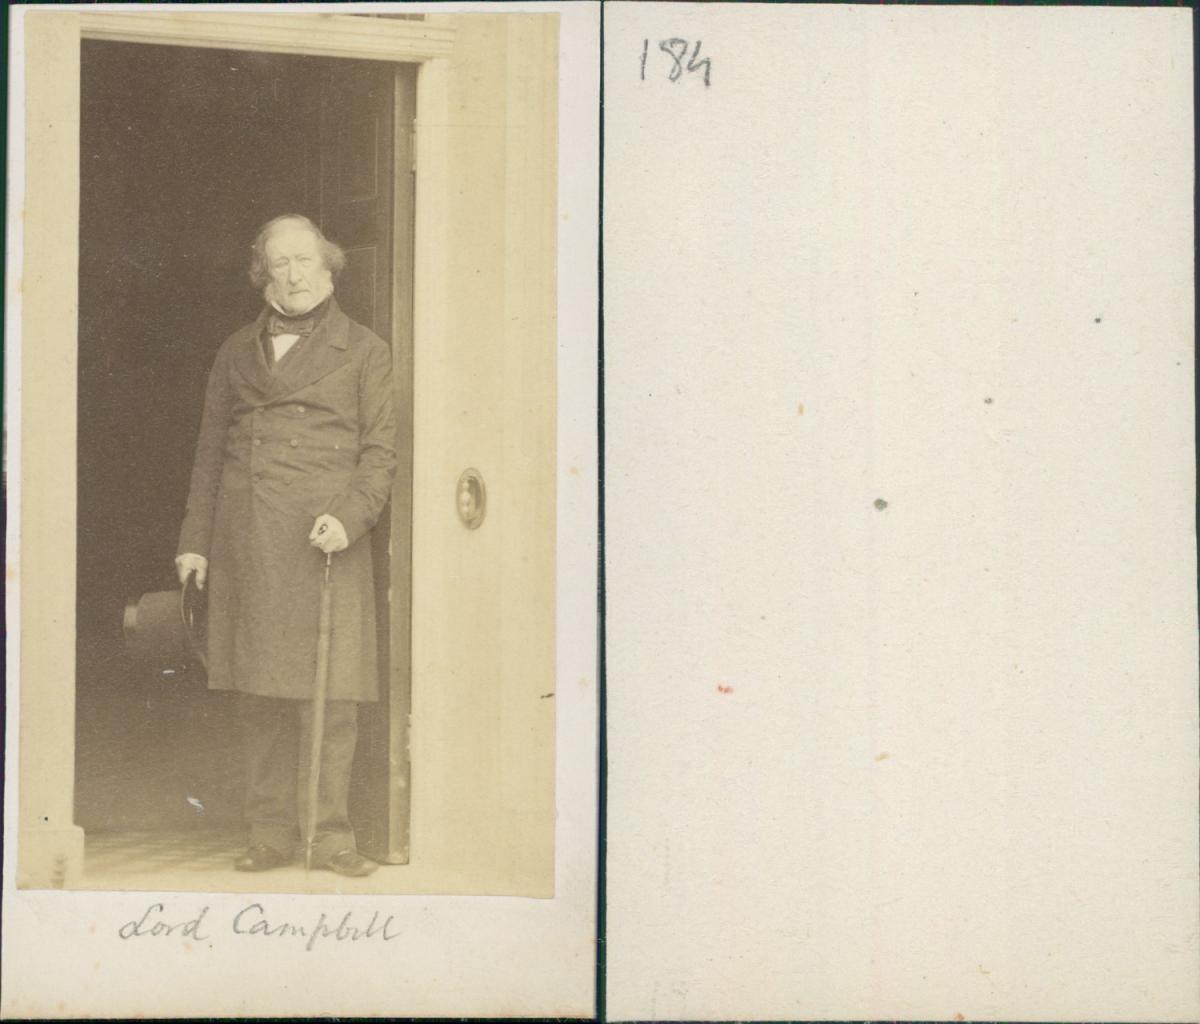 Lord Campbell John 1st Baron Photographie Originale Foto Des Verkaufers